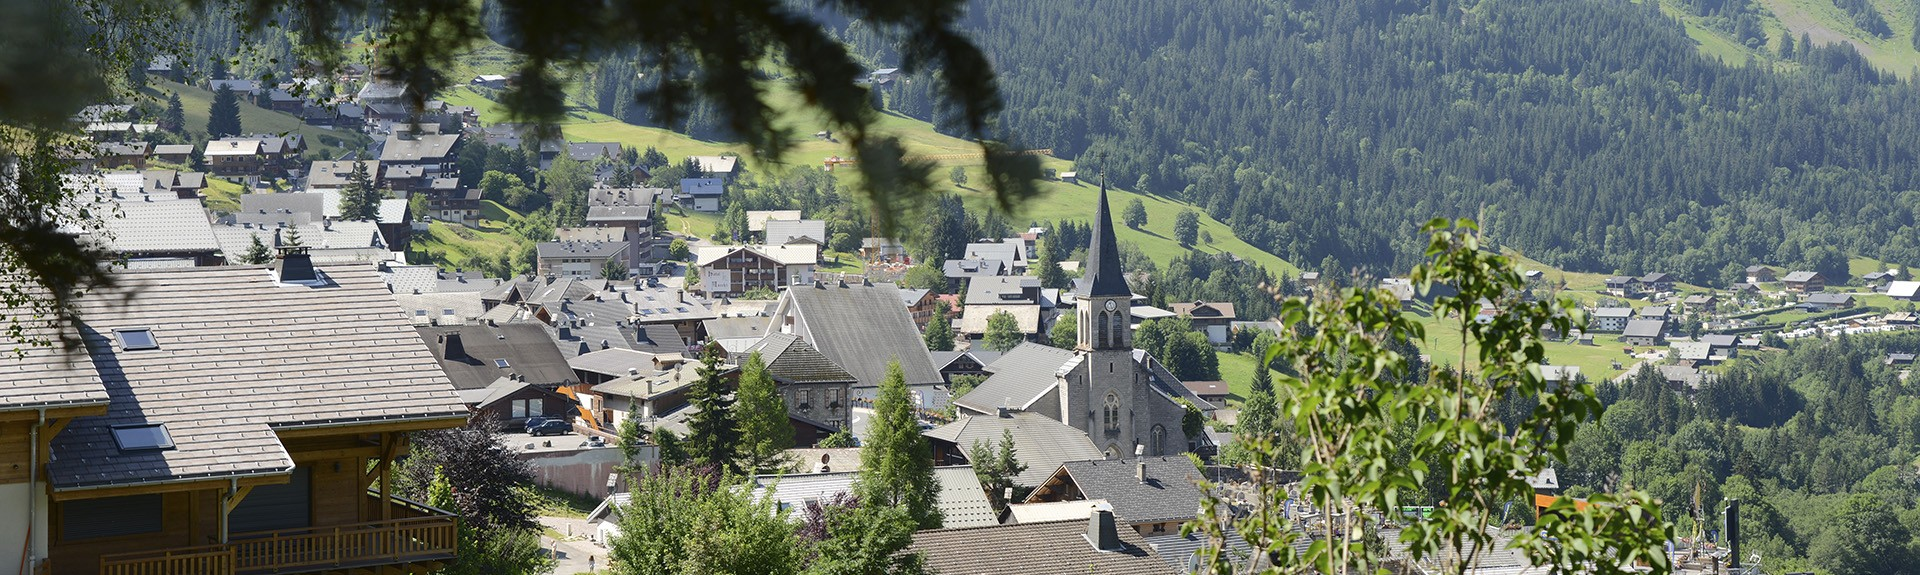 Church, chapels